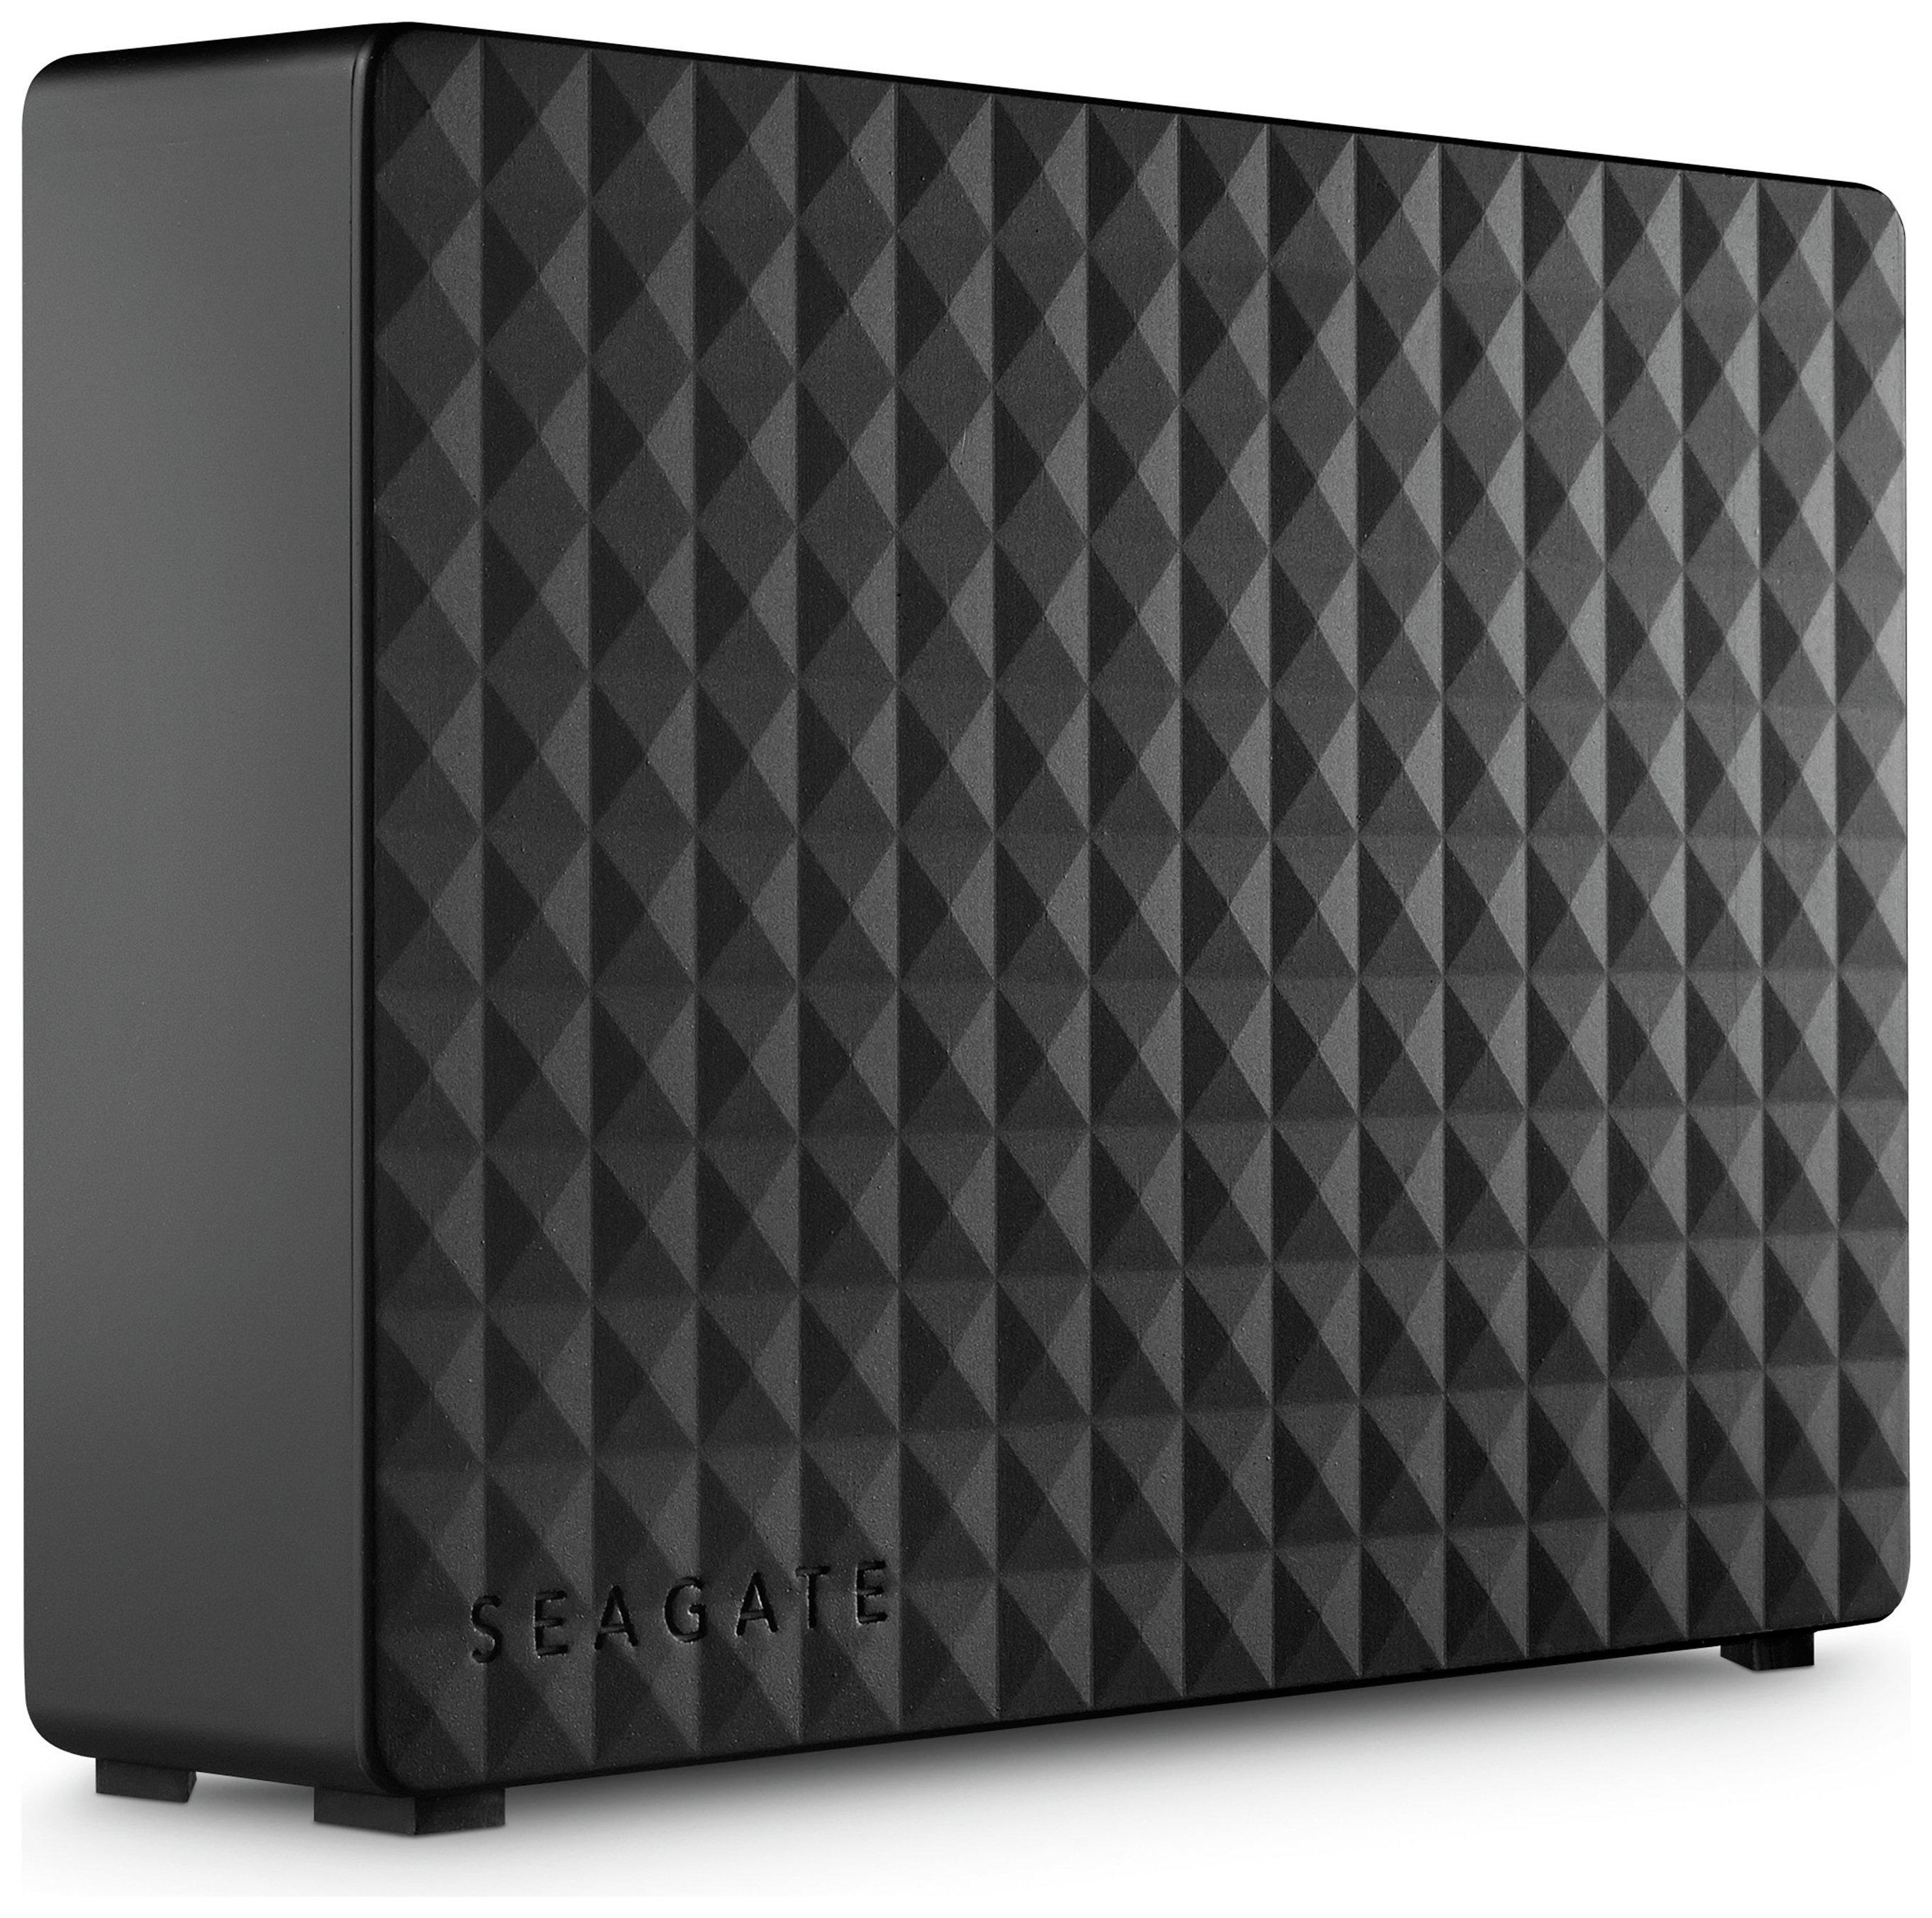 Seagate Seagate Expansion 3TB Desktop USB 3.0 Hard Drive - Black.